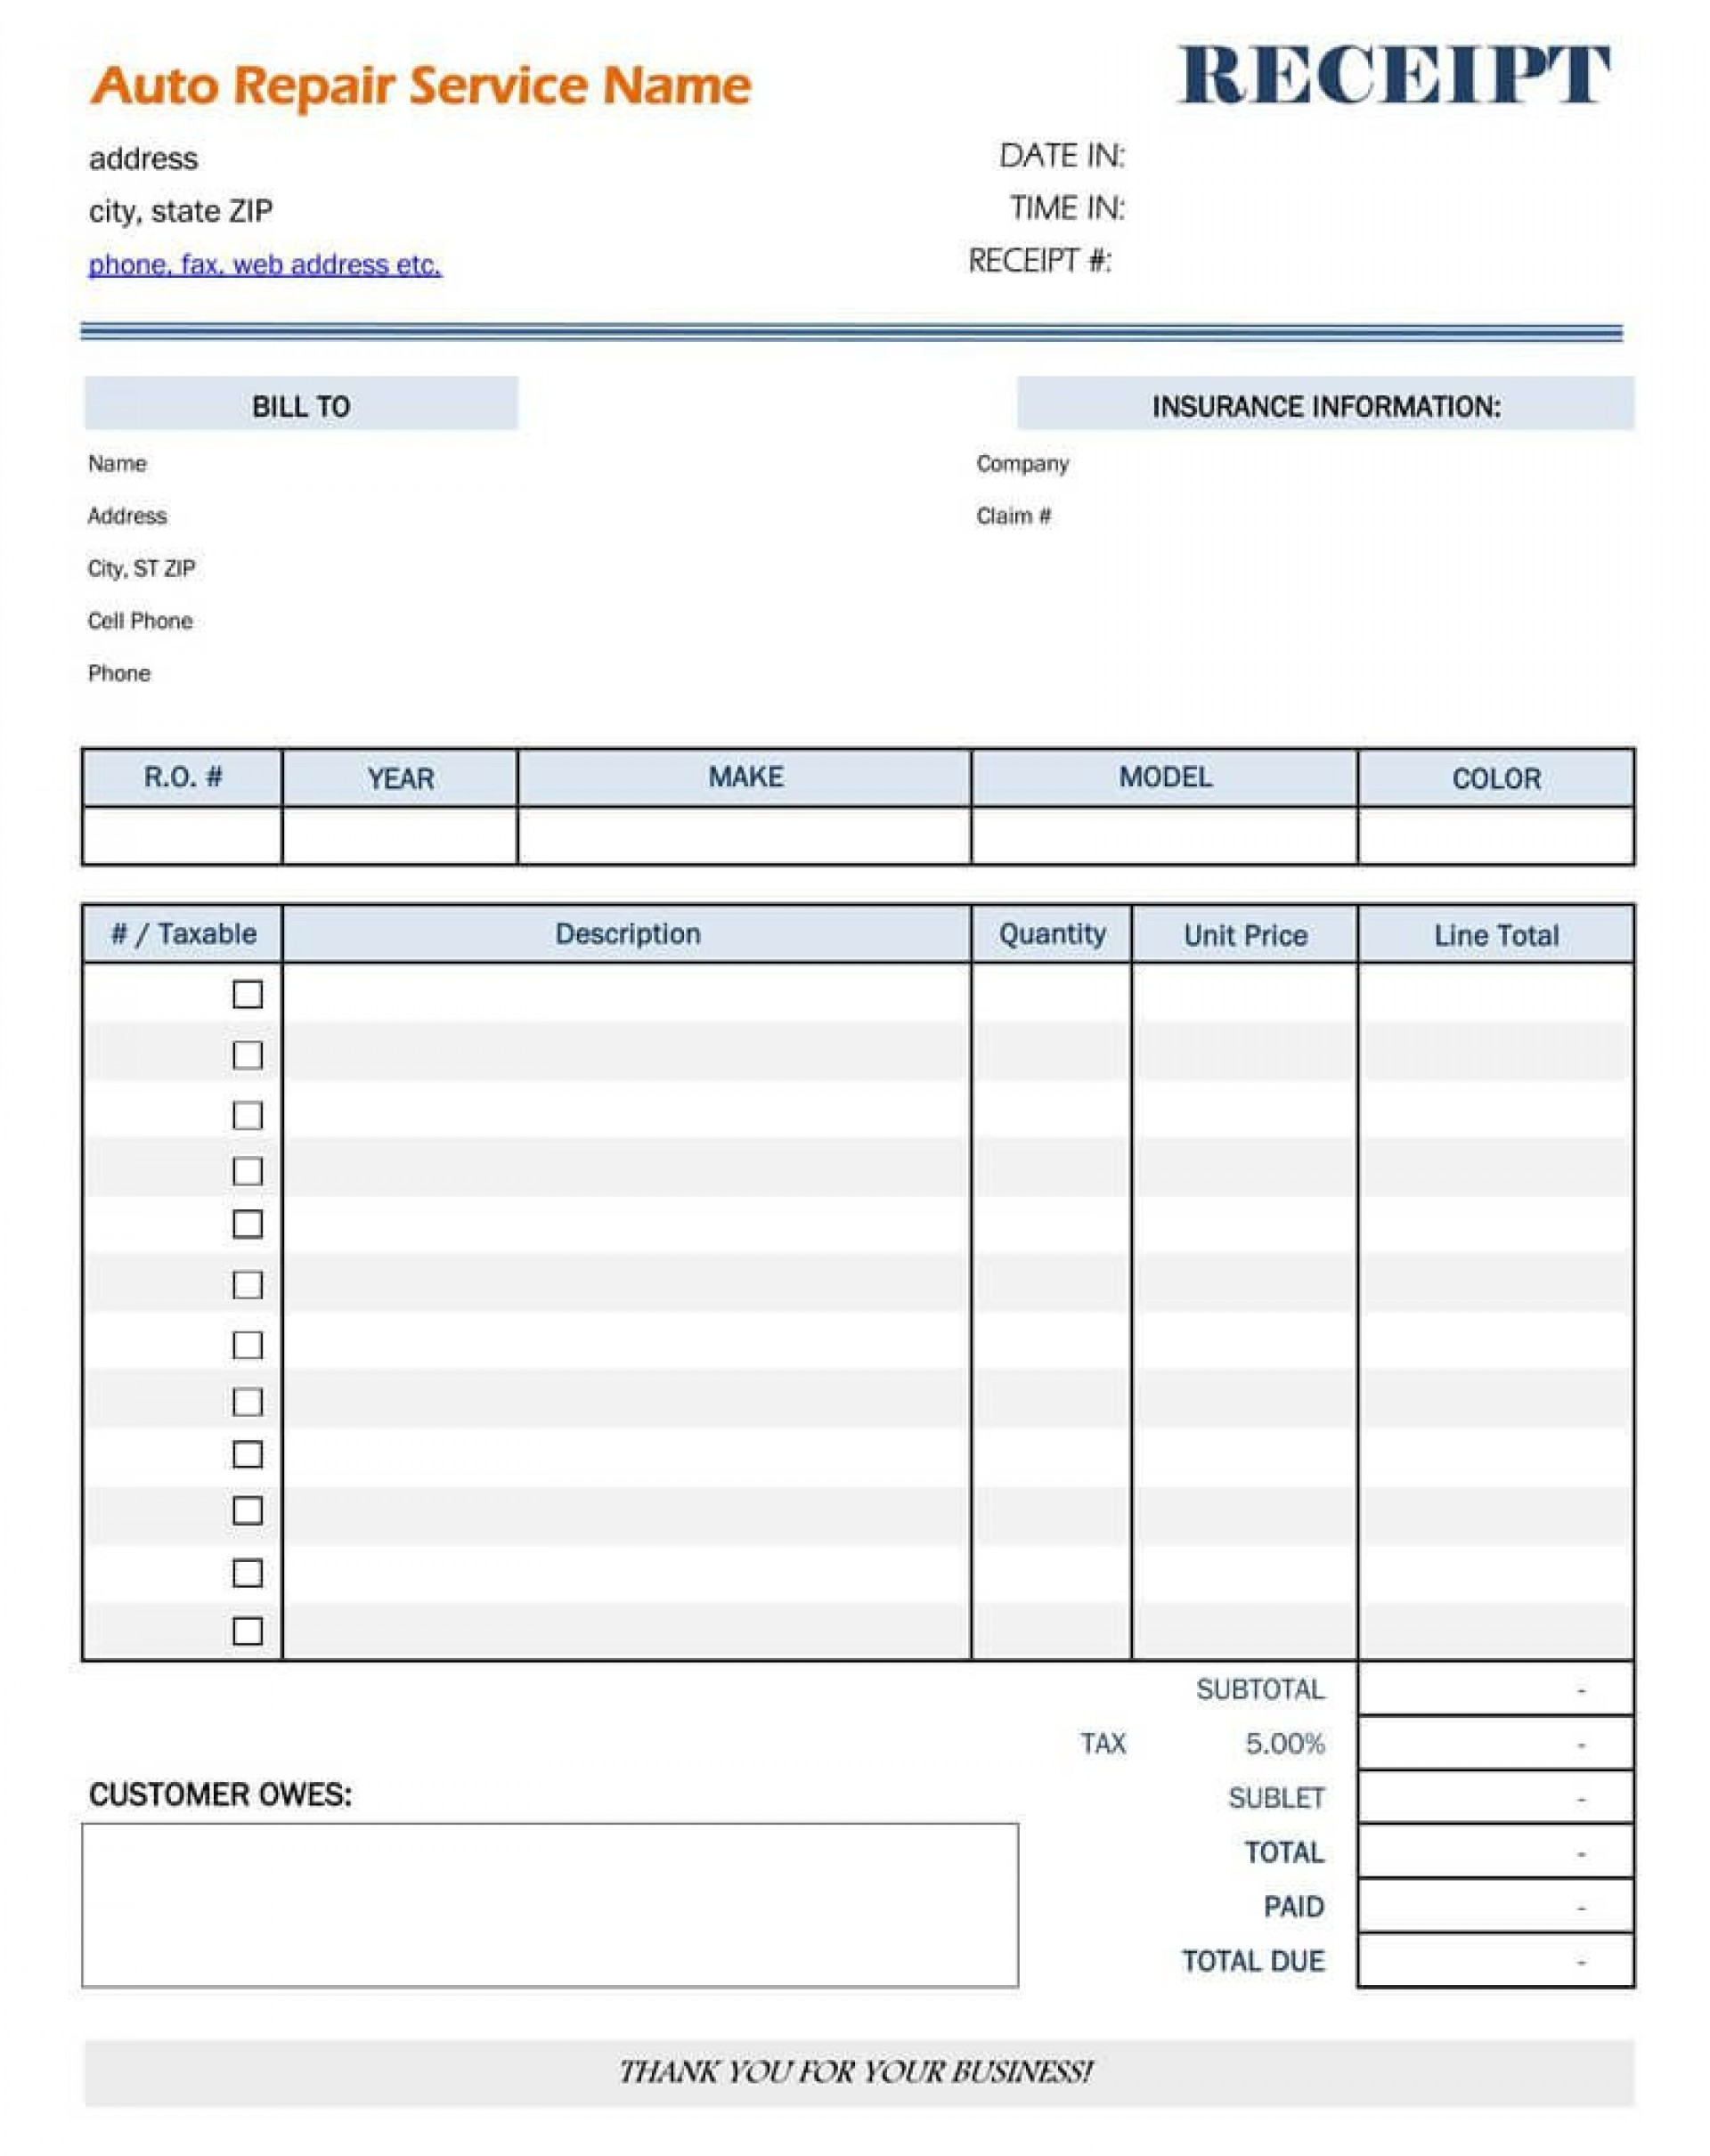 002 Unique Microsoft Word Auto Repair Invoice Template High Resolution 1920